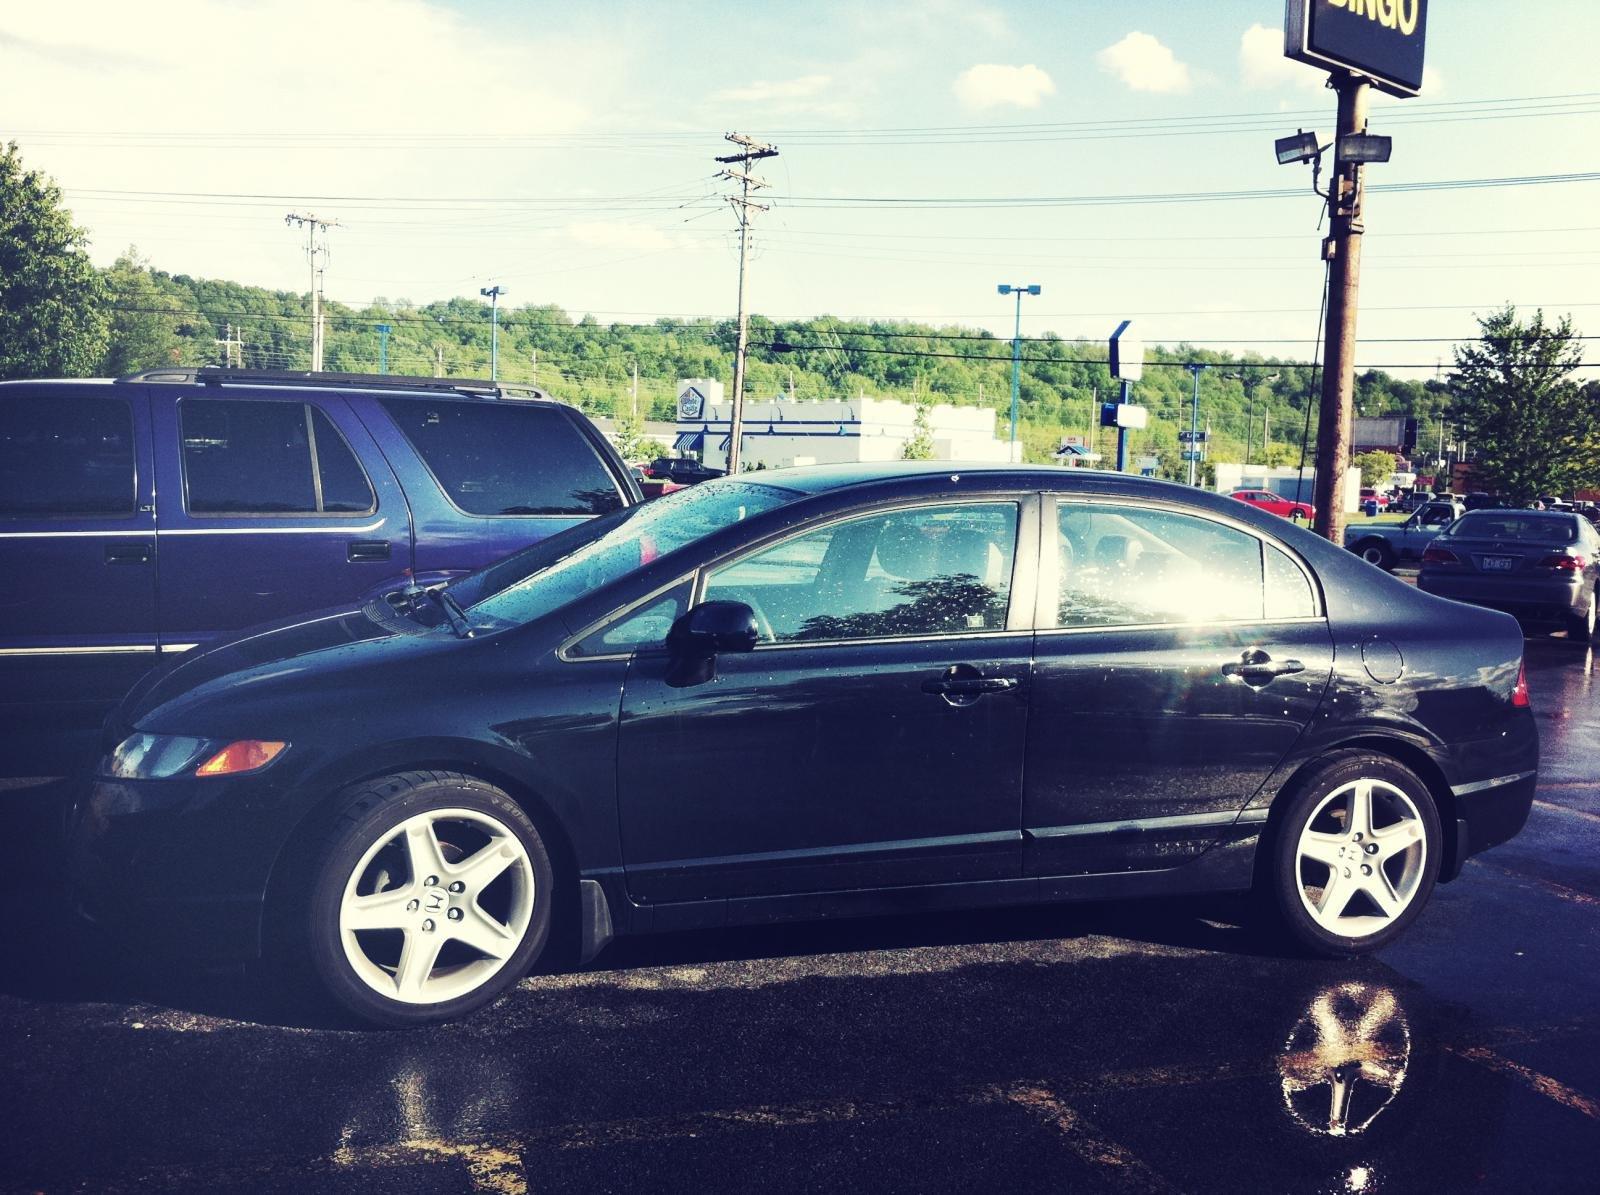 Acura TL Rims On Sedan LX Th Generation Honda Civic Forum - Acura tl rims black